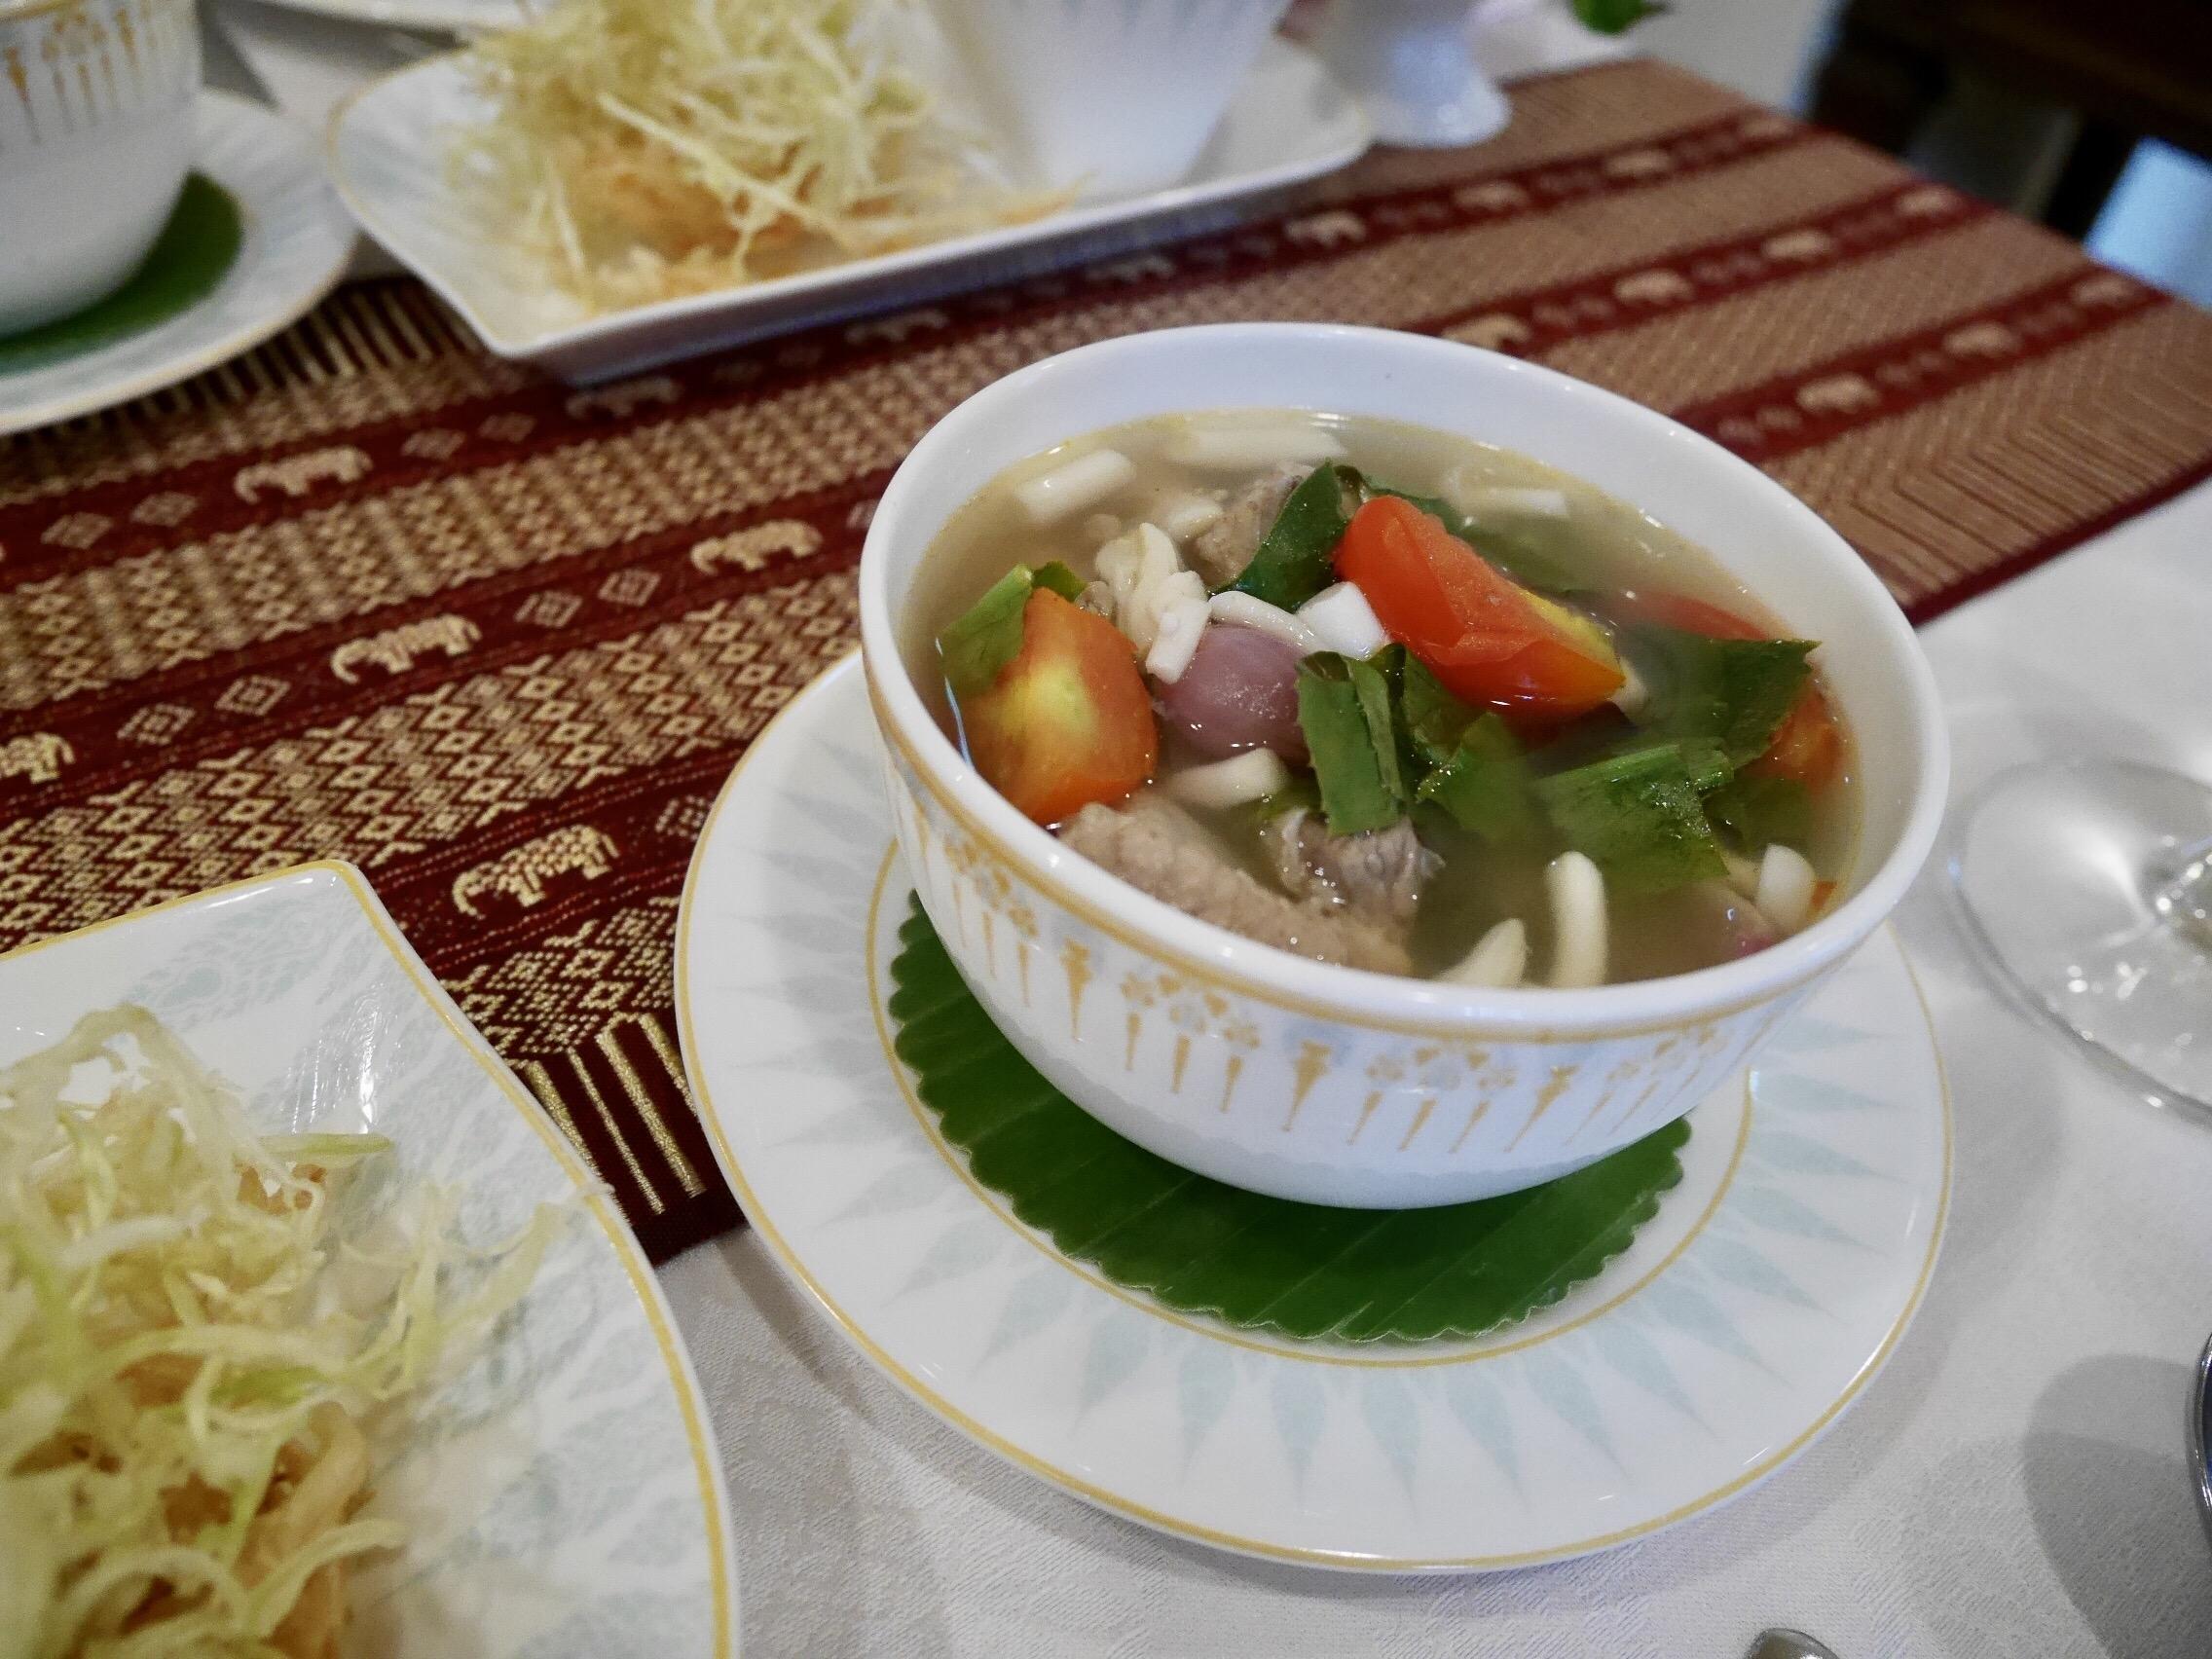 img 9042 - The Oriental Thai Cooking School - マンダリンオリエンタルバンコクのおもてなし空間で体験する絶品タイ料理教室